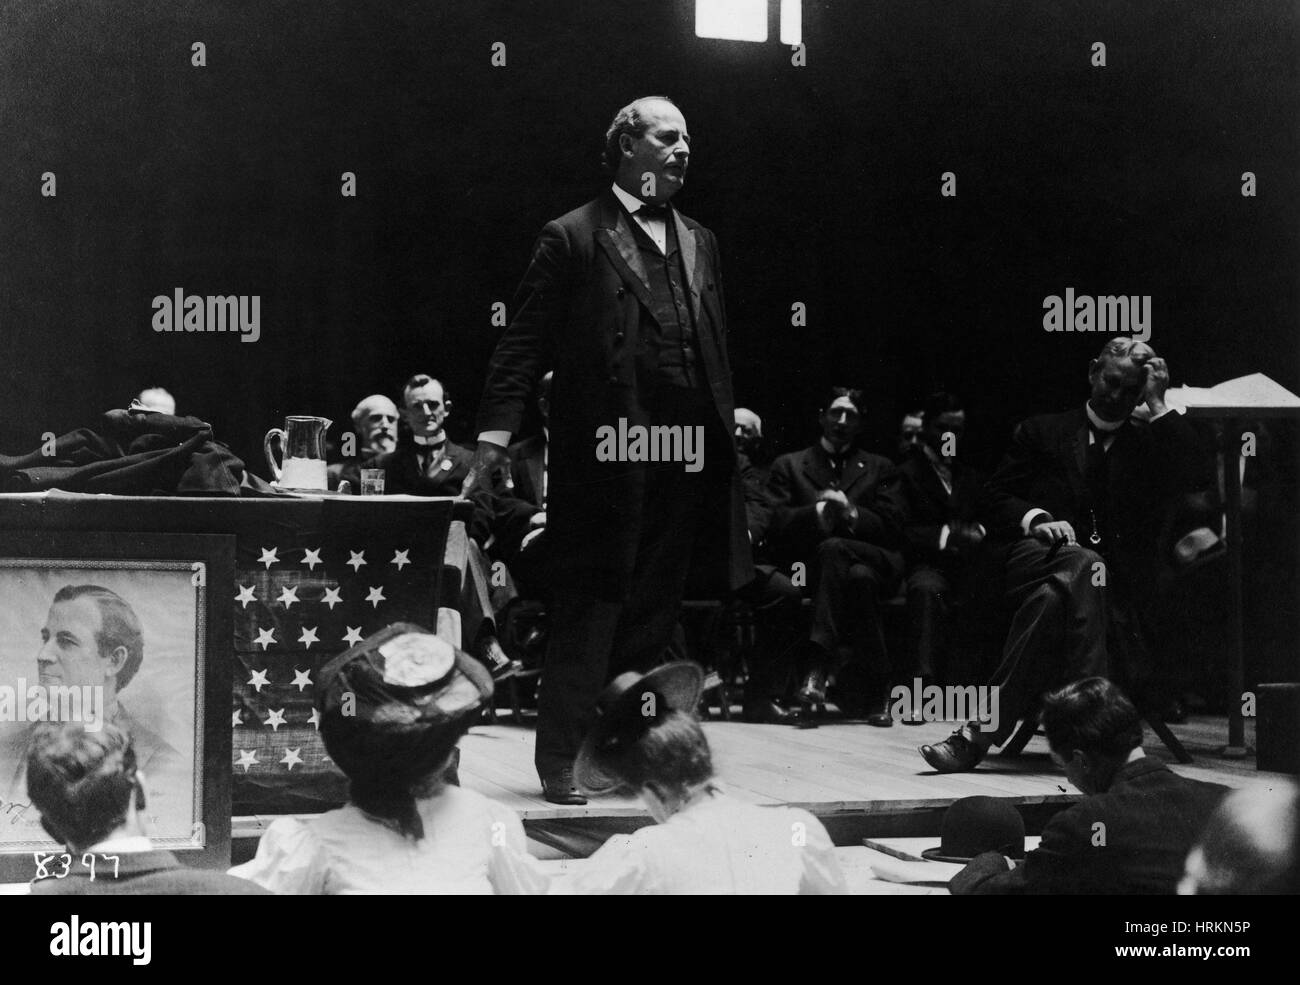 William Jennings Bryan, American Politician - Stock Image